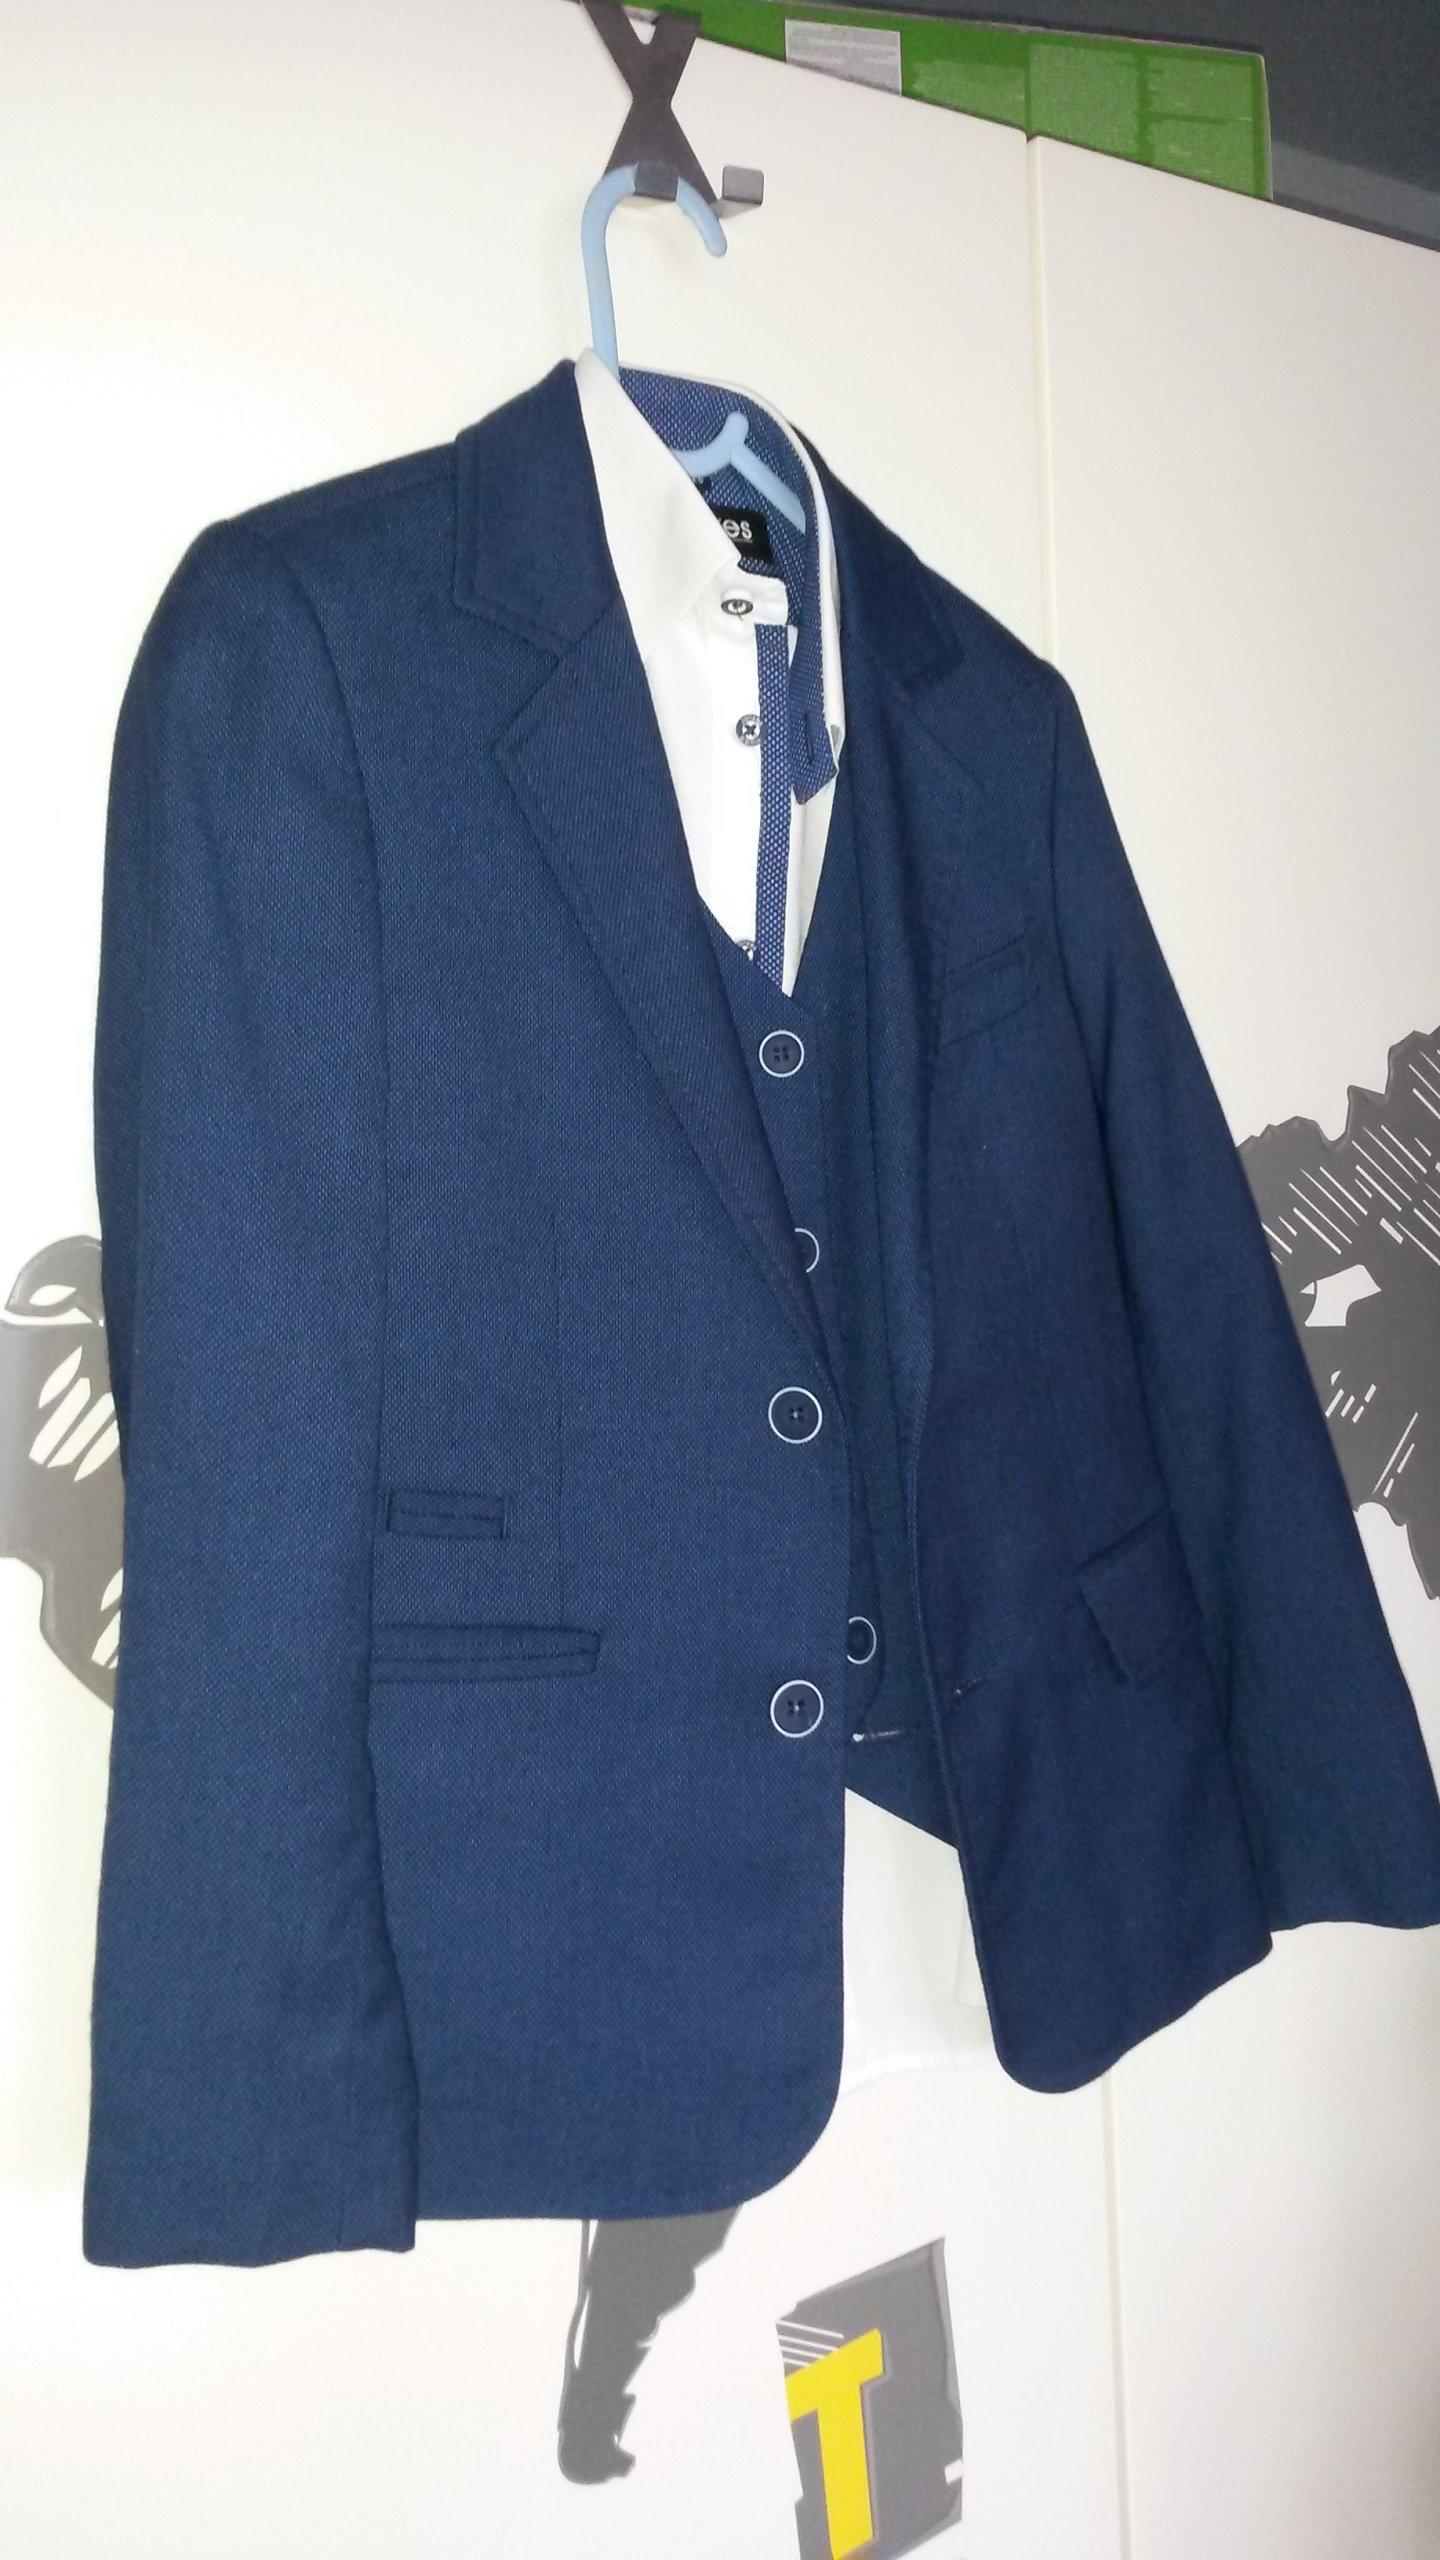 9b9bac4ef0 Super garnitur firmy Jankes moda 122-128 - 7140832988 - oficjalne ...